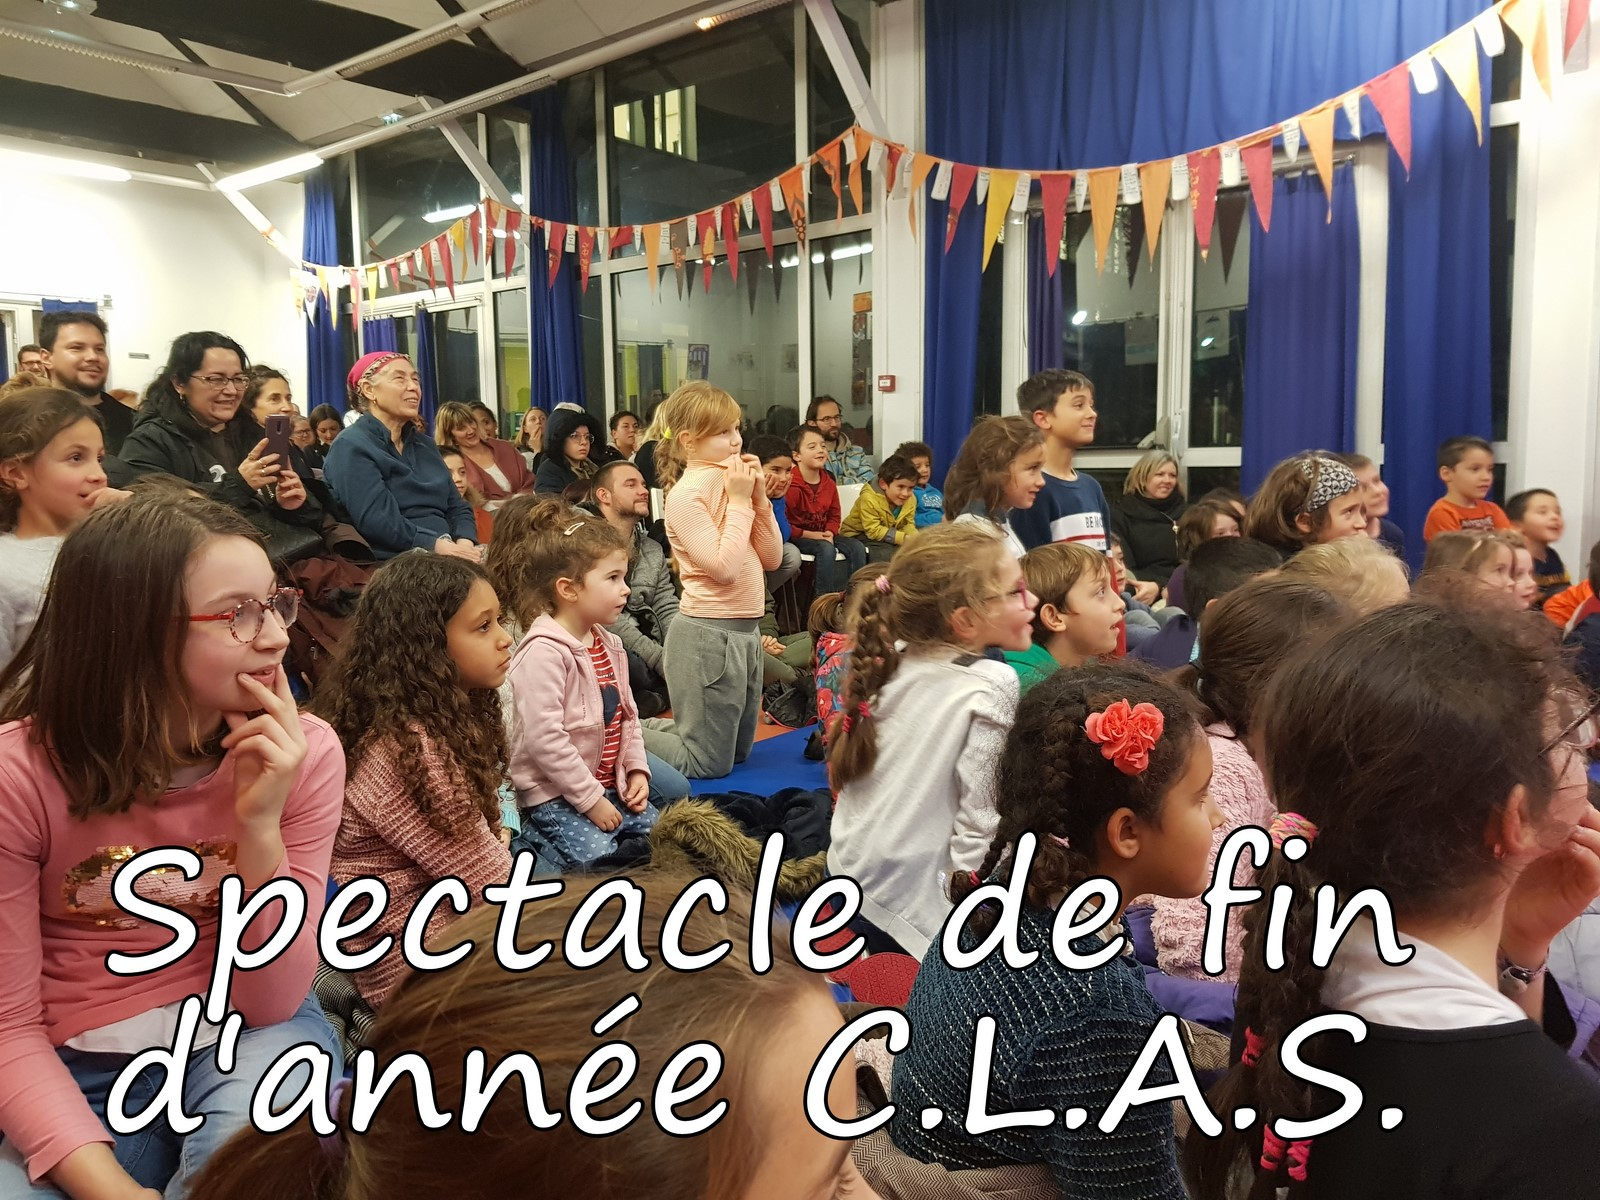 Spectacle-de-fin-dannee-CLAS